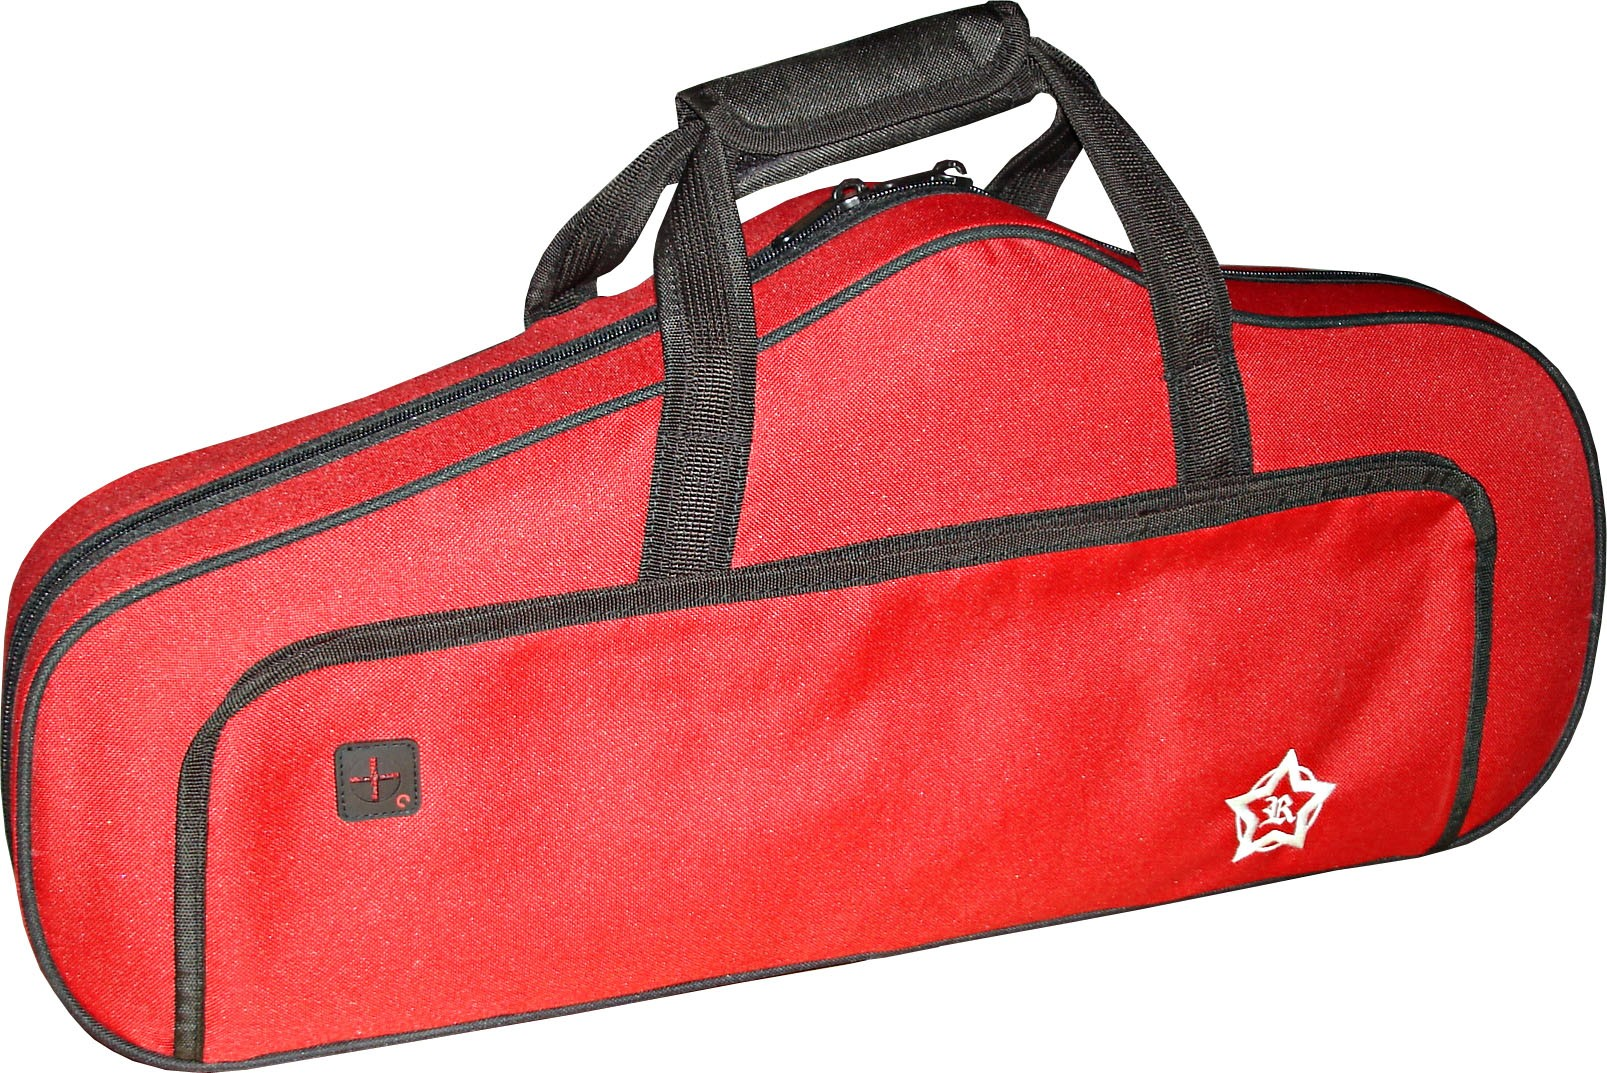 Rosetti Alto Saxophone Bag - Red